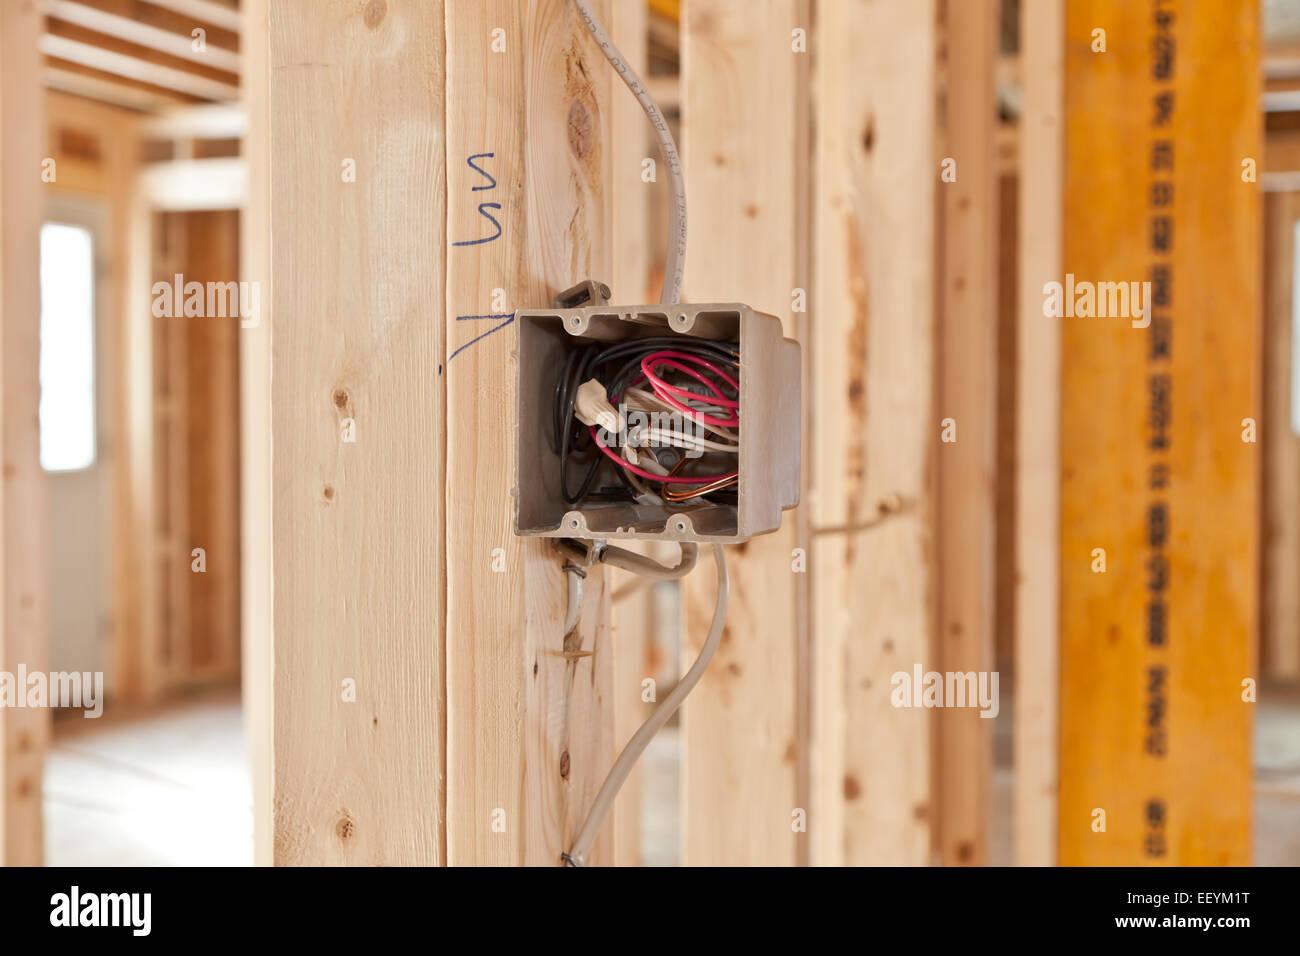 Elektroinstallation im Haus Neubau Stockfoto, Bild: 78055092 - Alamy